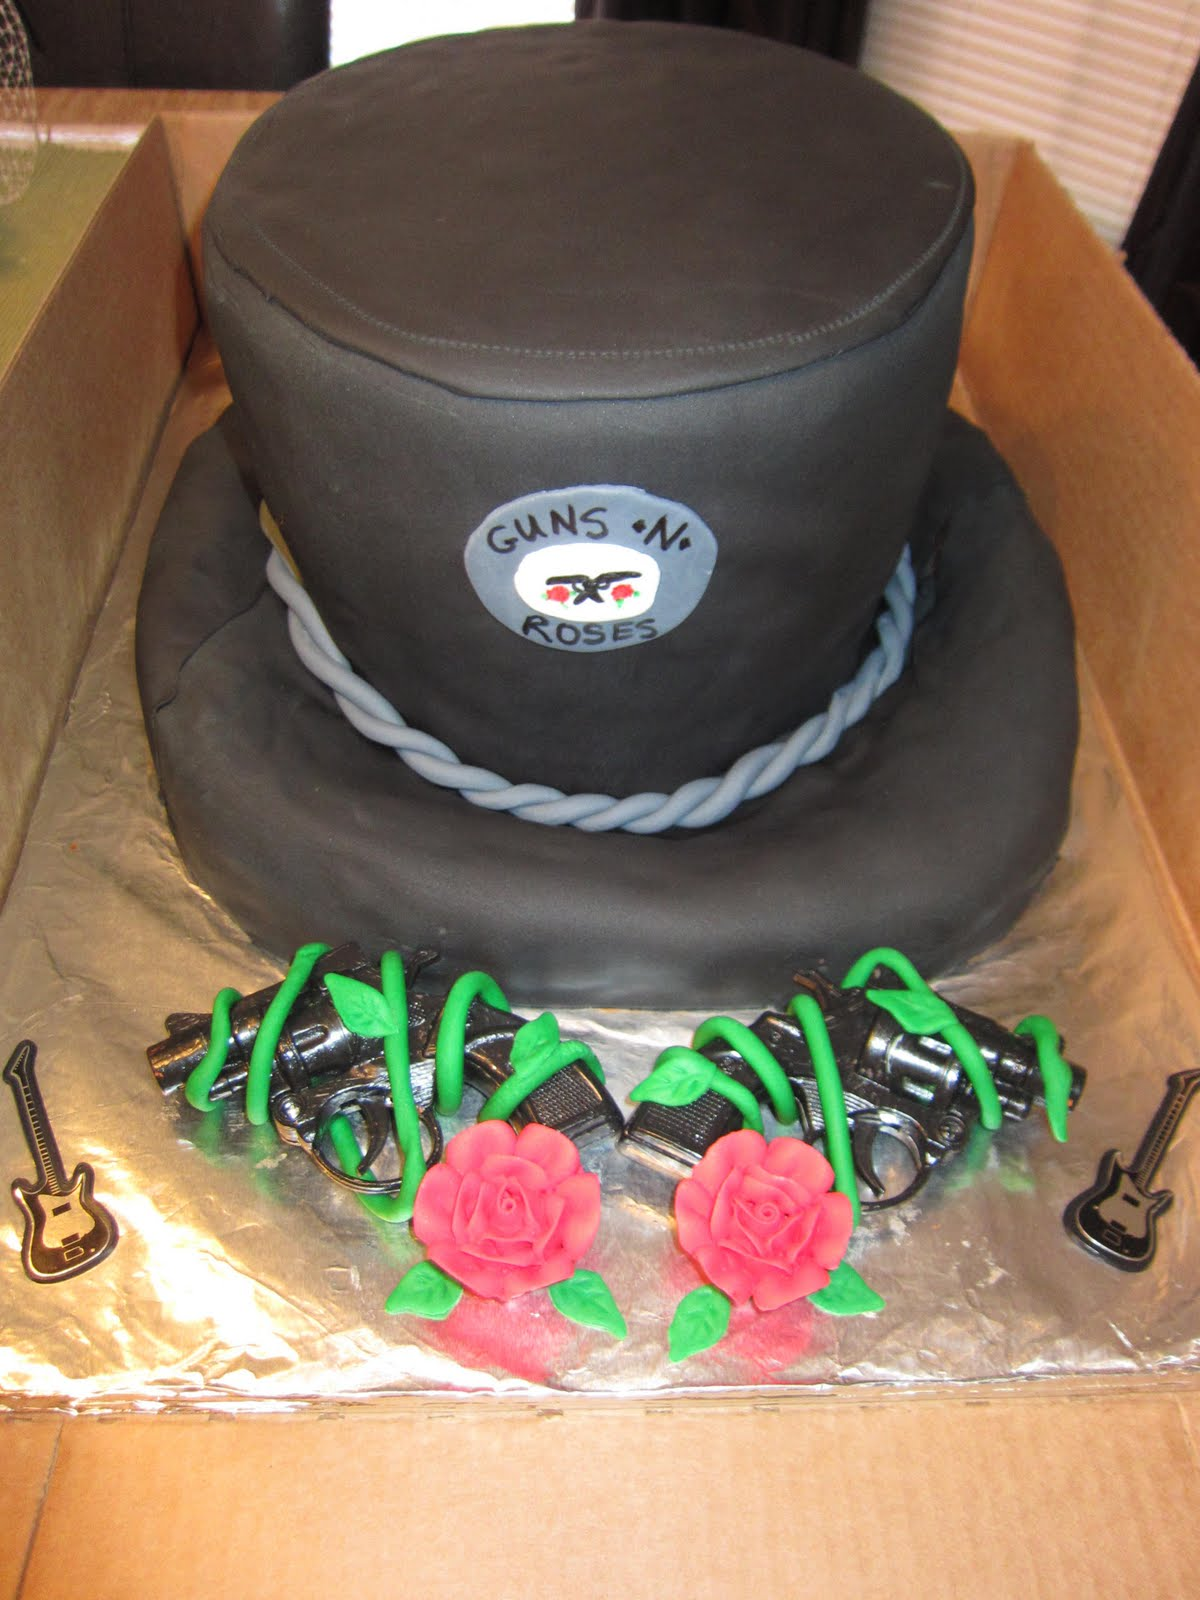 http://4.bp.blogspot.com/-YJxAy7LHT3g/Tgx7IRnOjzI/AAAAAAAAAE0/IZiRZWcE34g/s1600/Cake-GNR.JPG